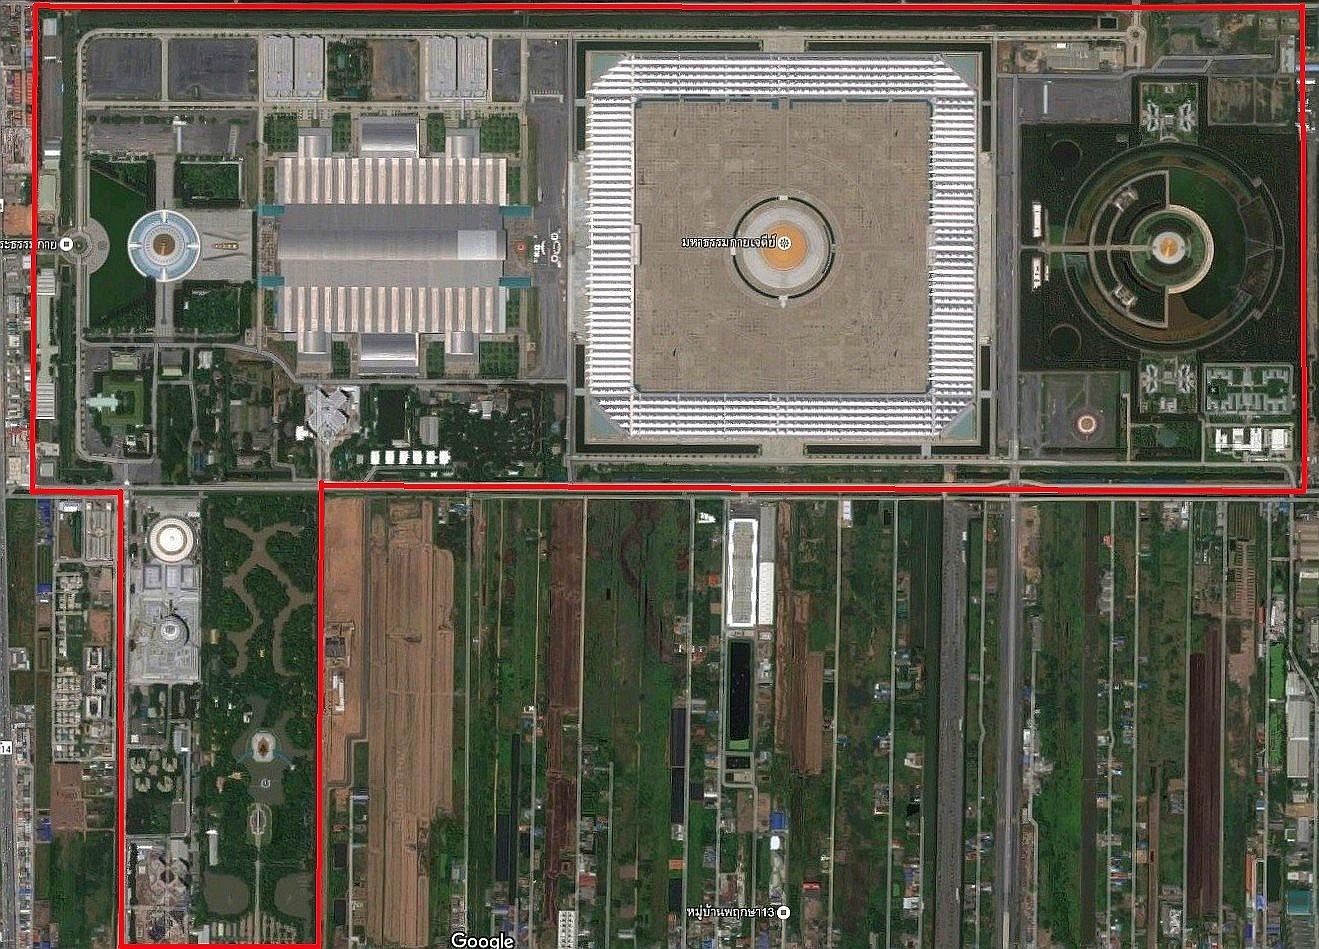 Satelitní fotografie celého areálu Wat Phra Dhammakaya - Thajsko